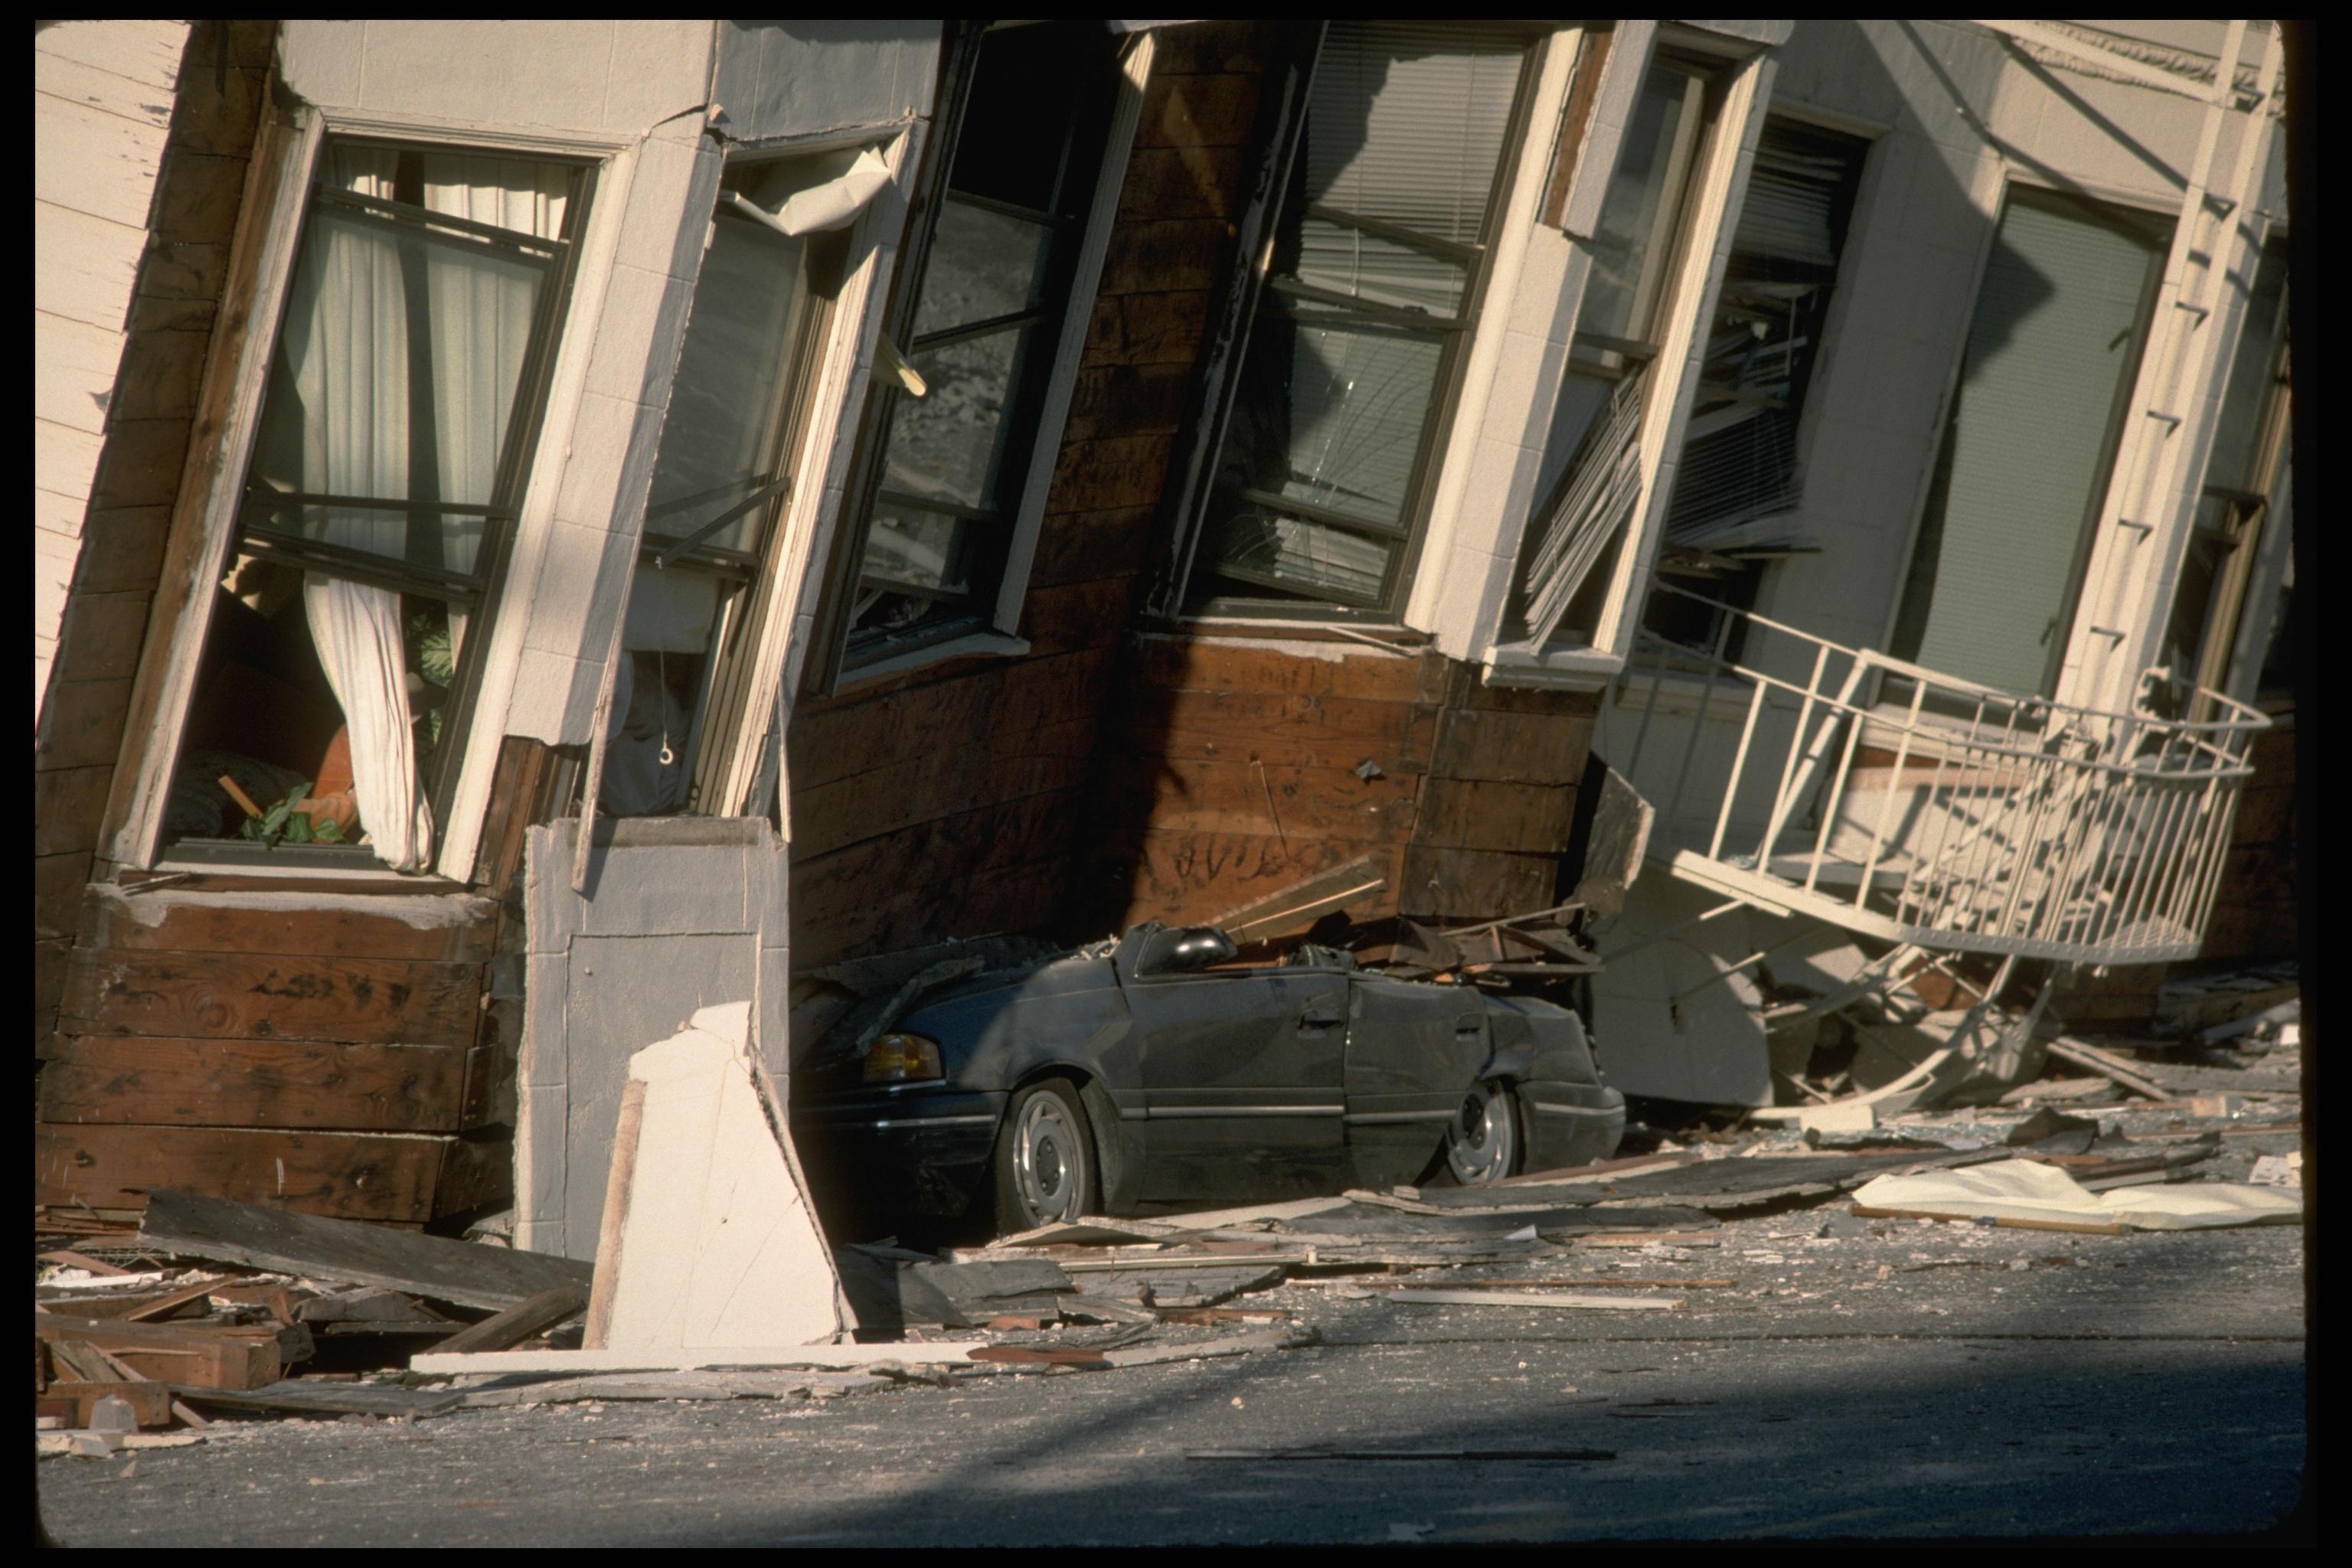 25 years since loma prieta earthquake photo